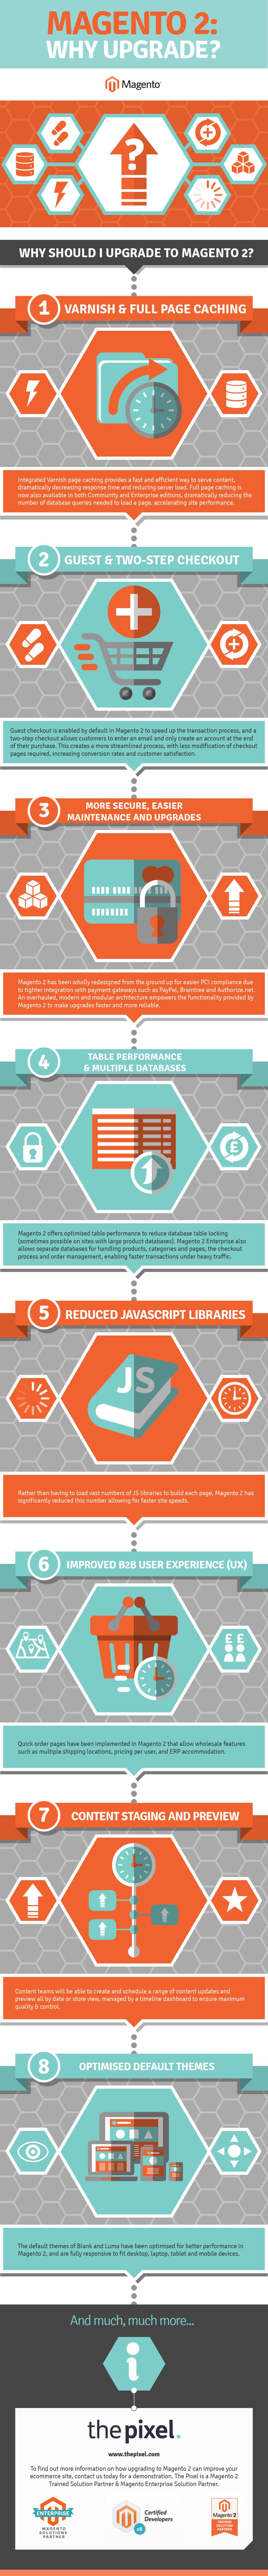 Magento 2: Why Upgrade? Infographic